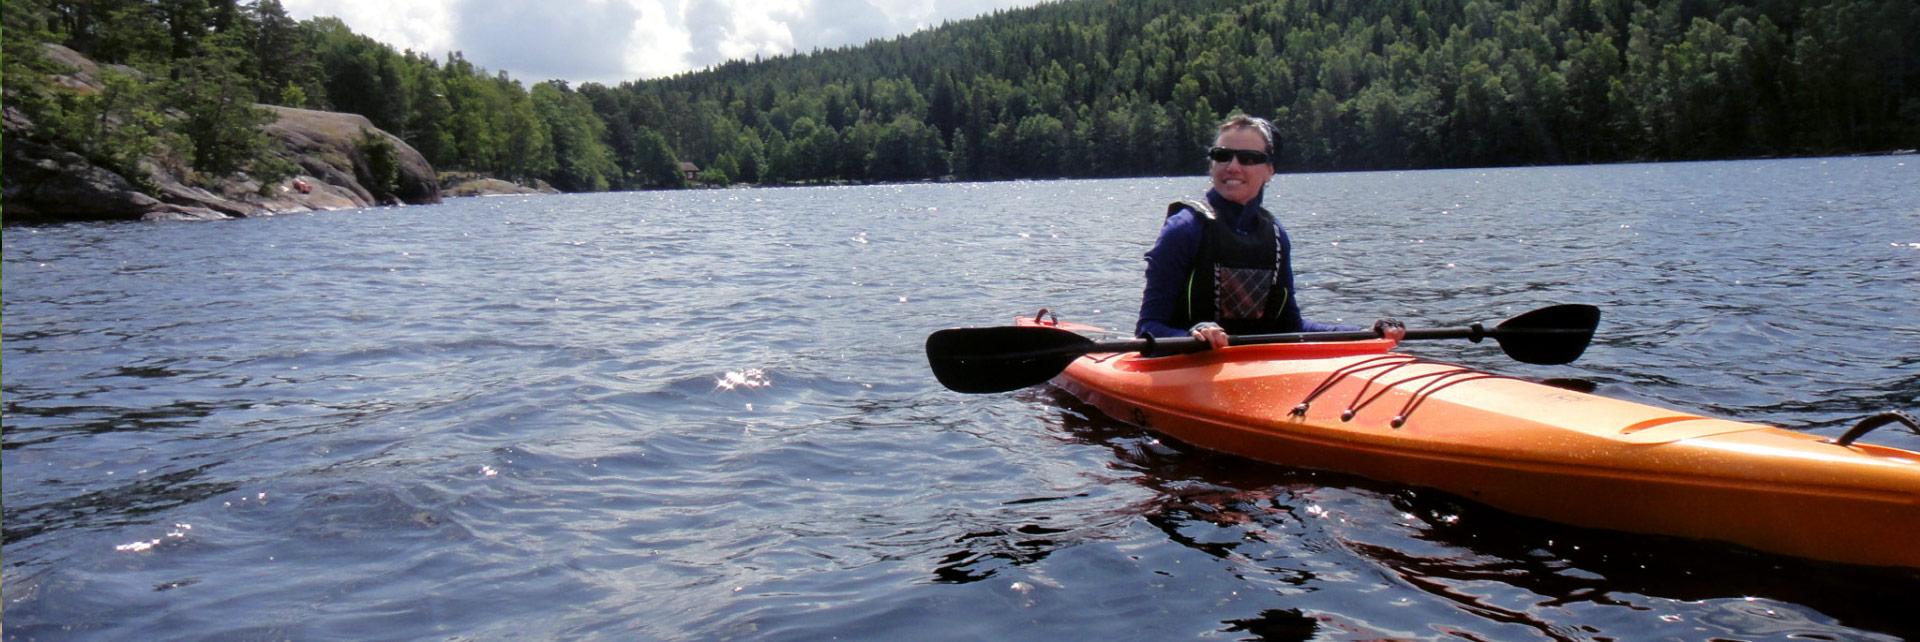 kayak-aventura-ojasport